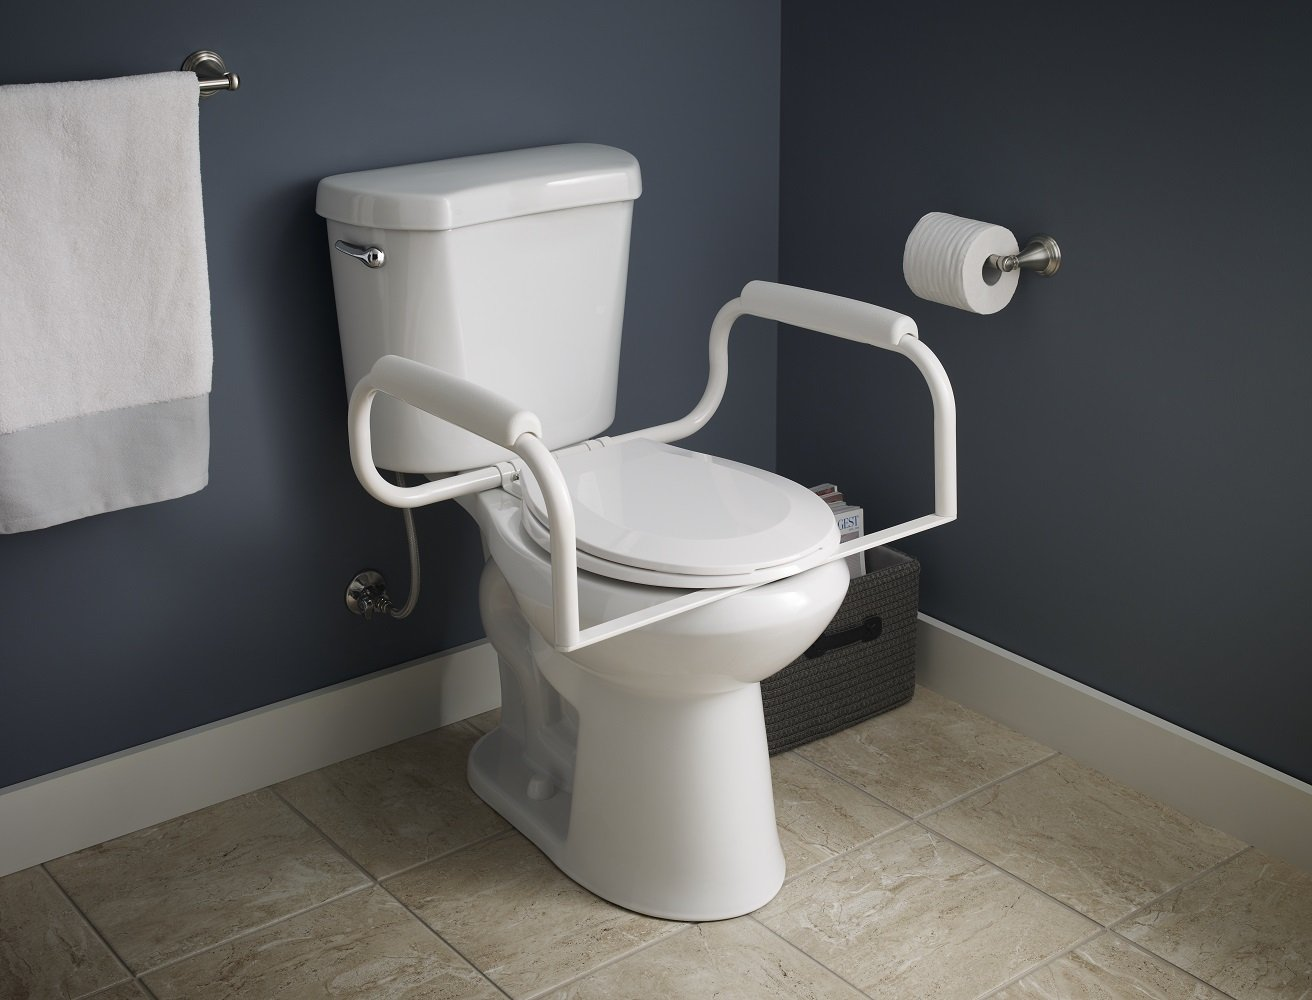 Delta DF575 Toilet Bath Safety Bar